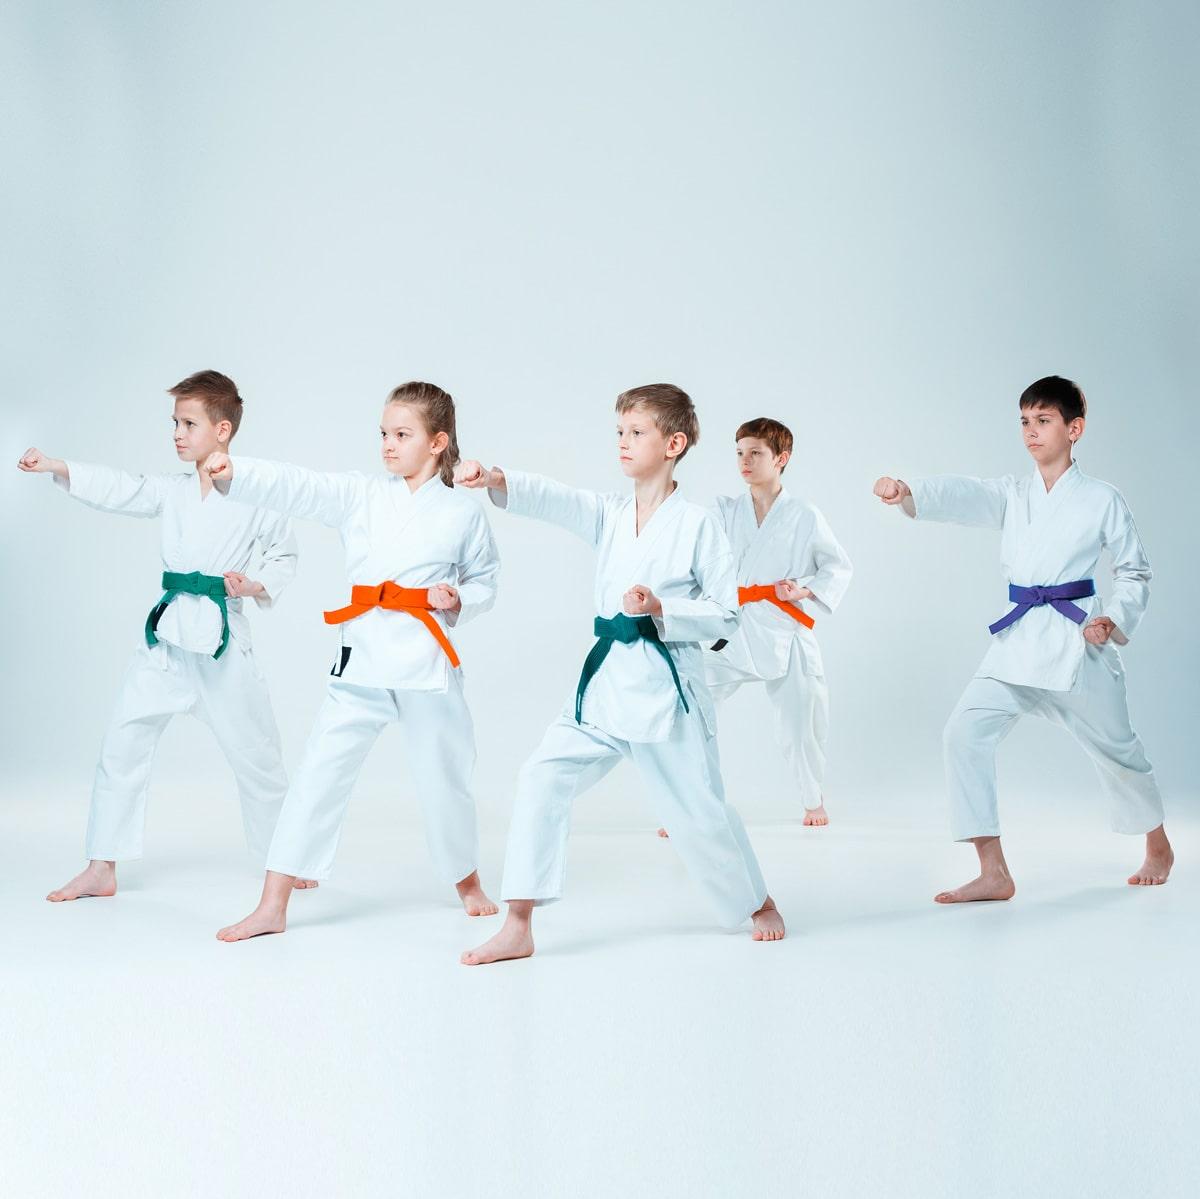 Kids doing Karate at Dojo